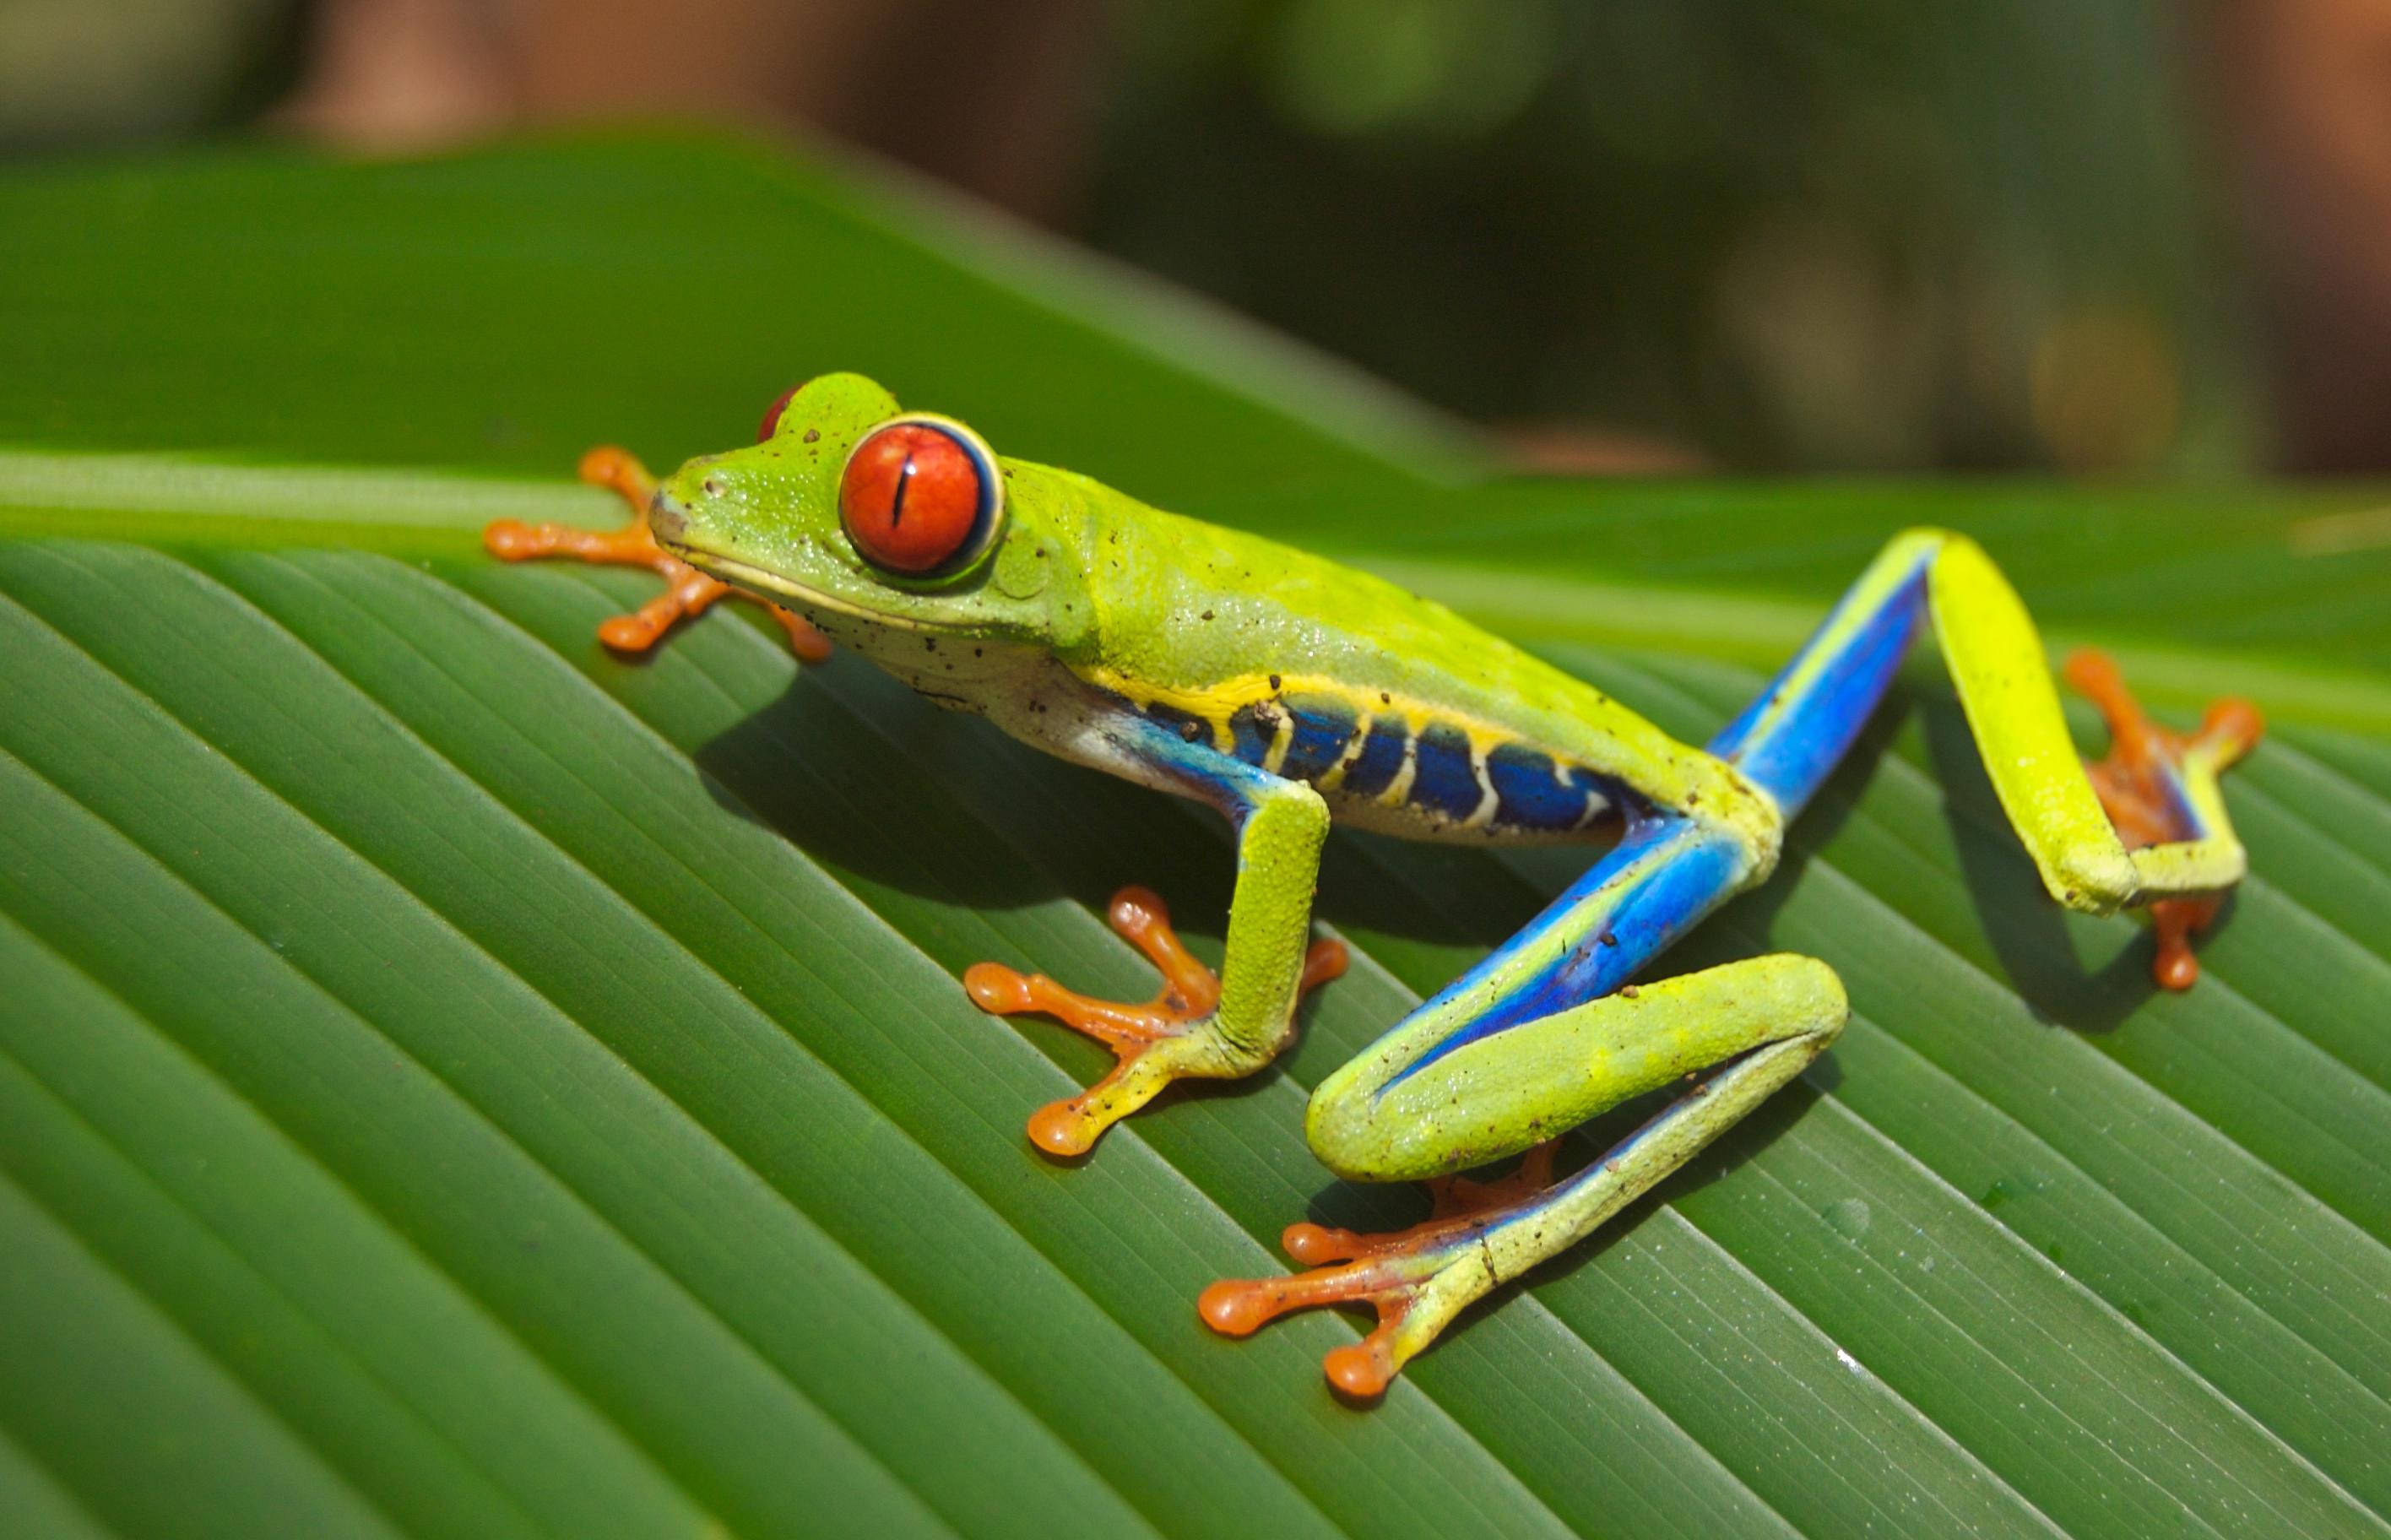 Red Eyed Tree Frog, Sculpting, Miniatures, 28mm, Tutorial, Frog, Monk, Skin Texture